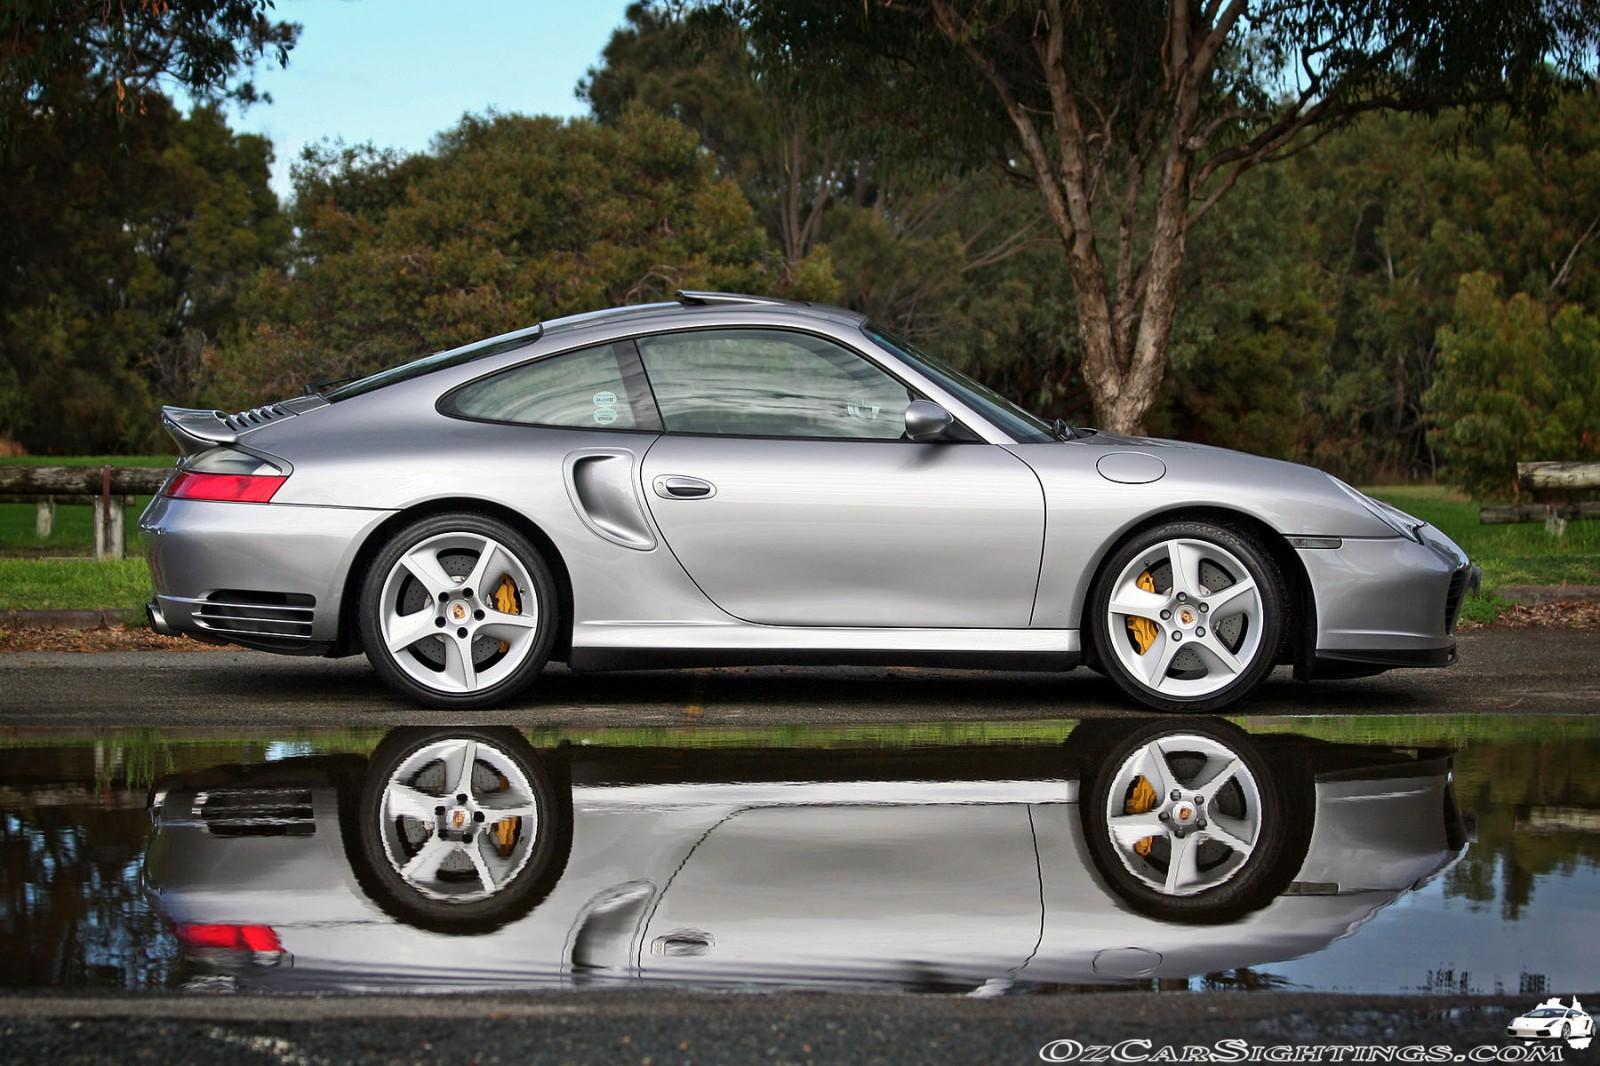 http://aussieexotics.com/drivers/albums/imported/dingo/porsche-996tt-sphotoshoot/porsche-996-turbo-s-(24).jpg